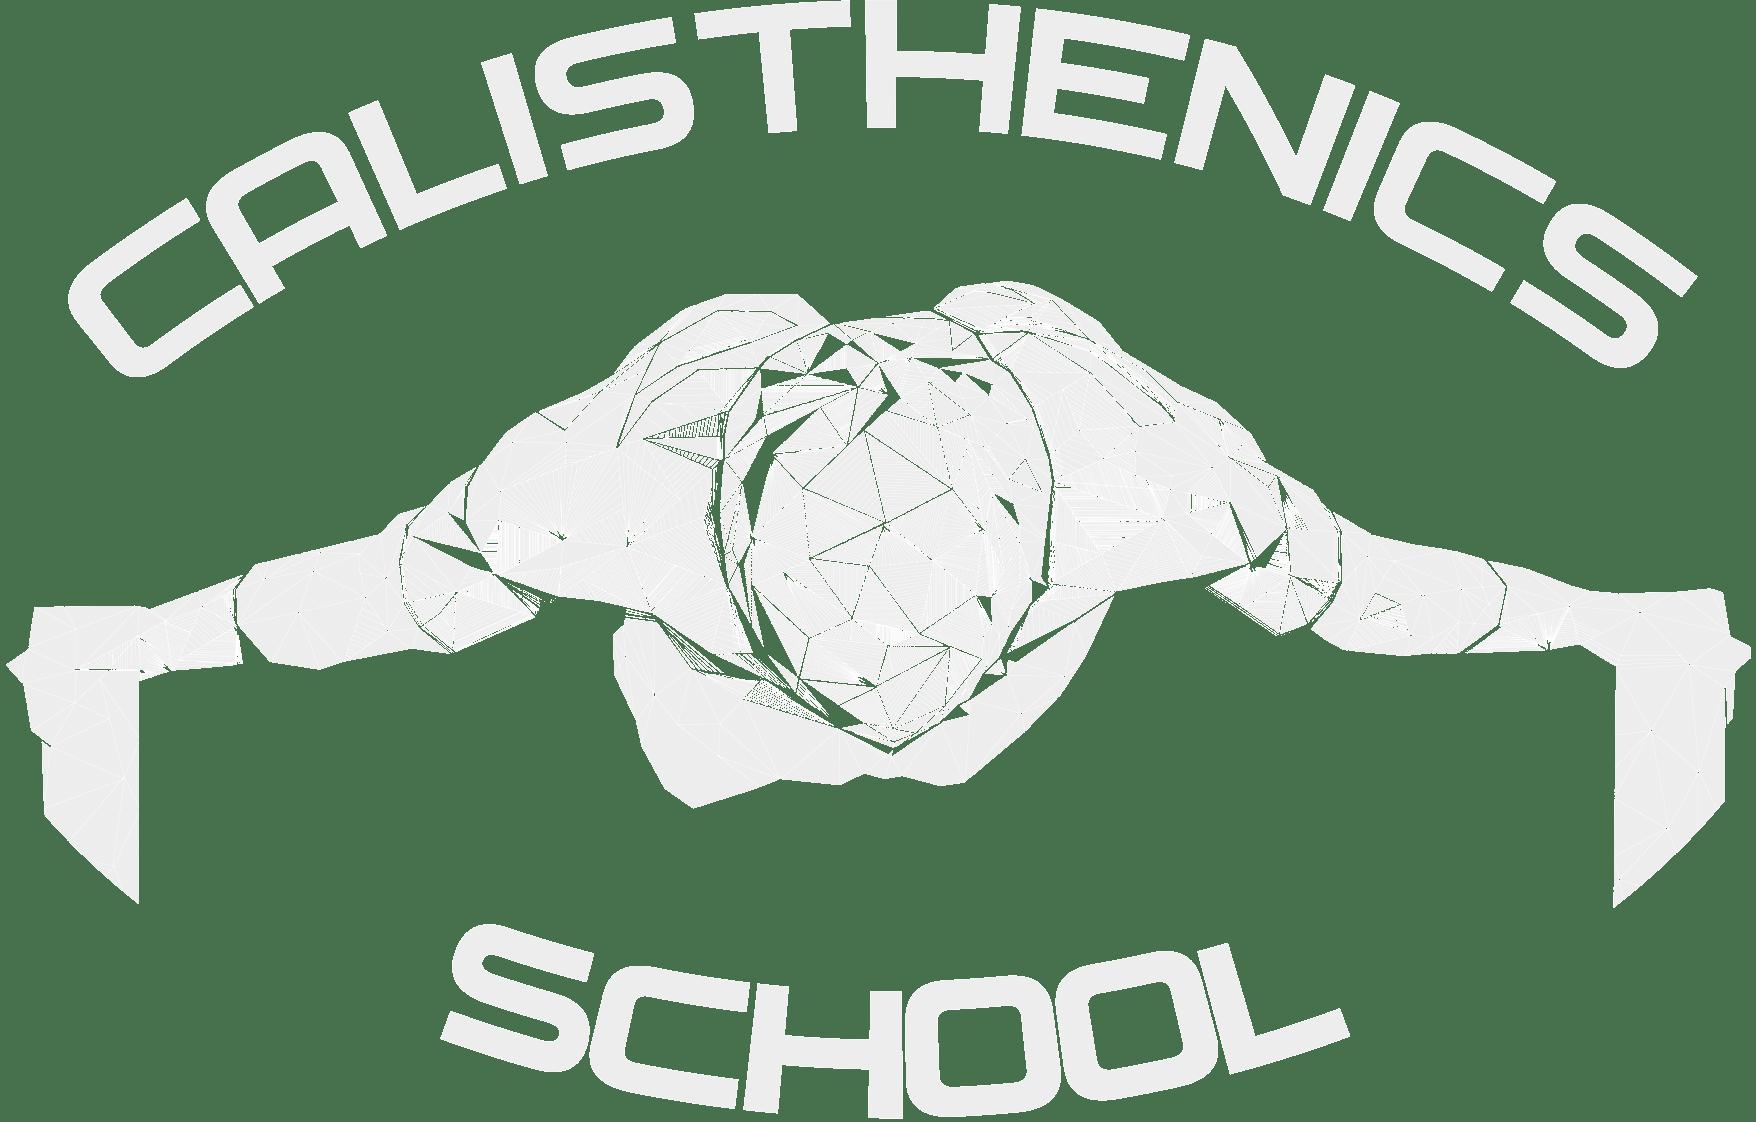 The Calisthenics School